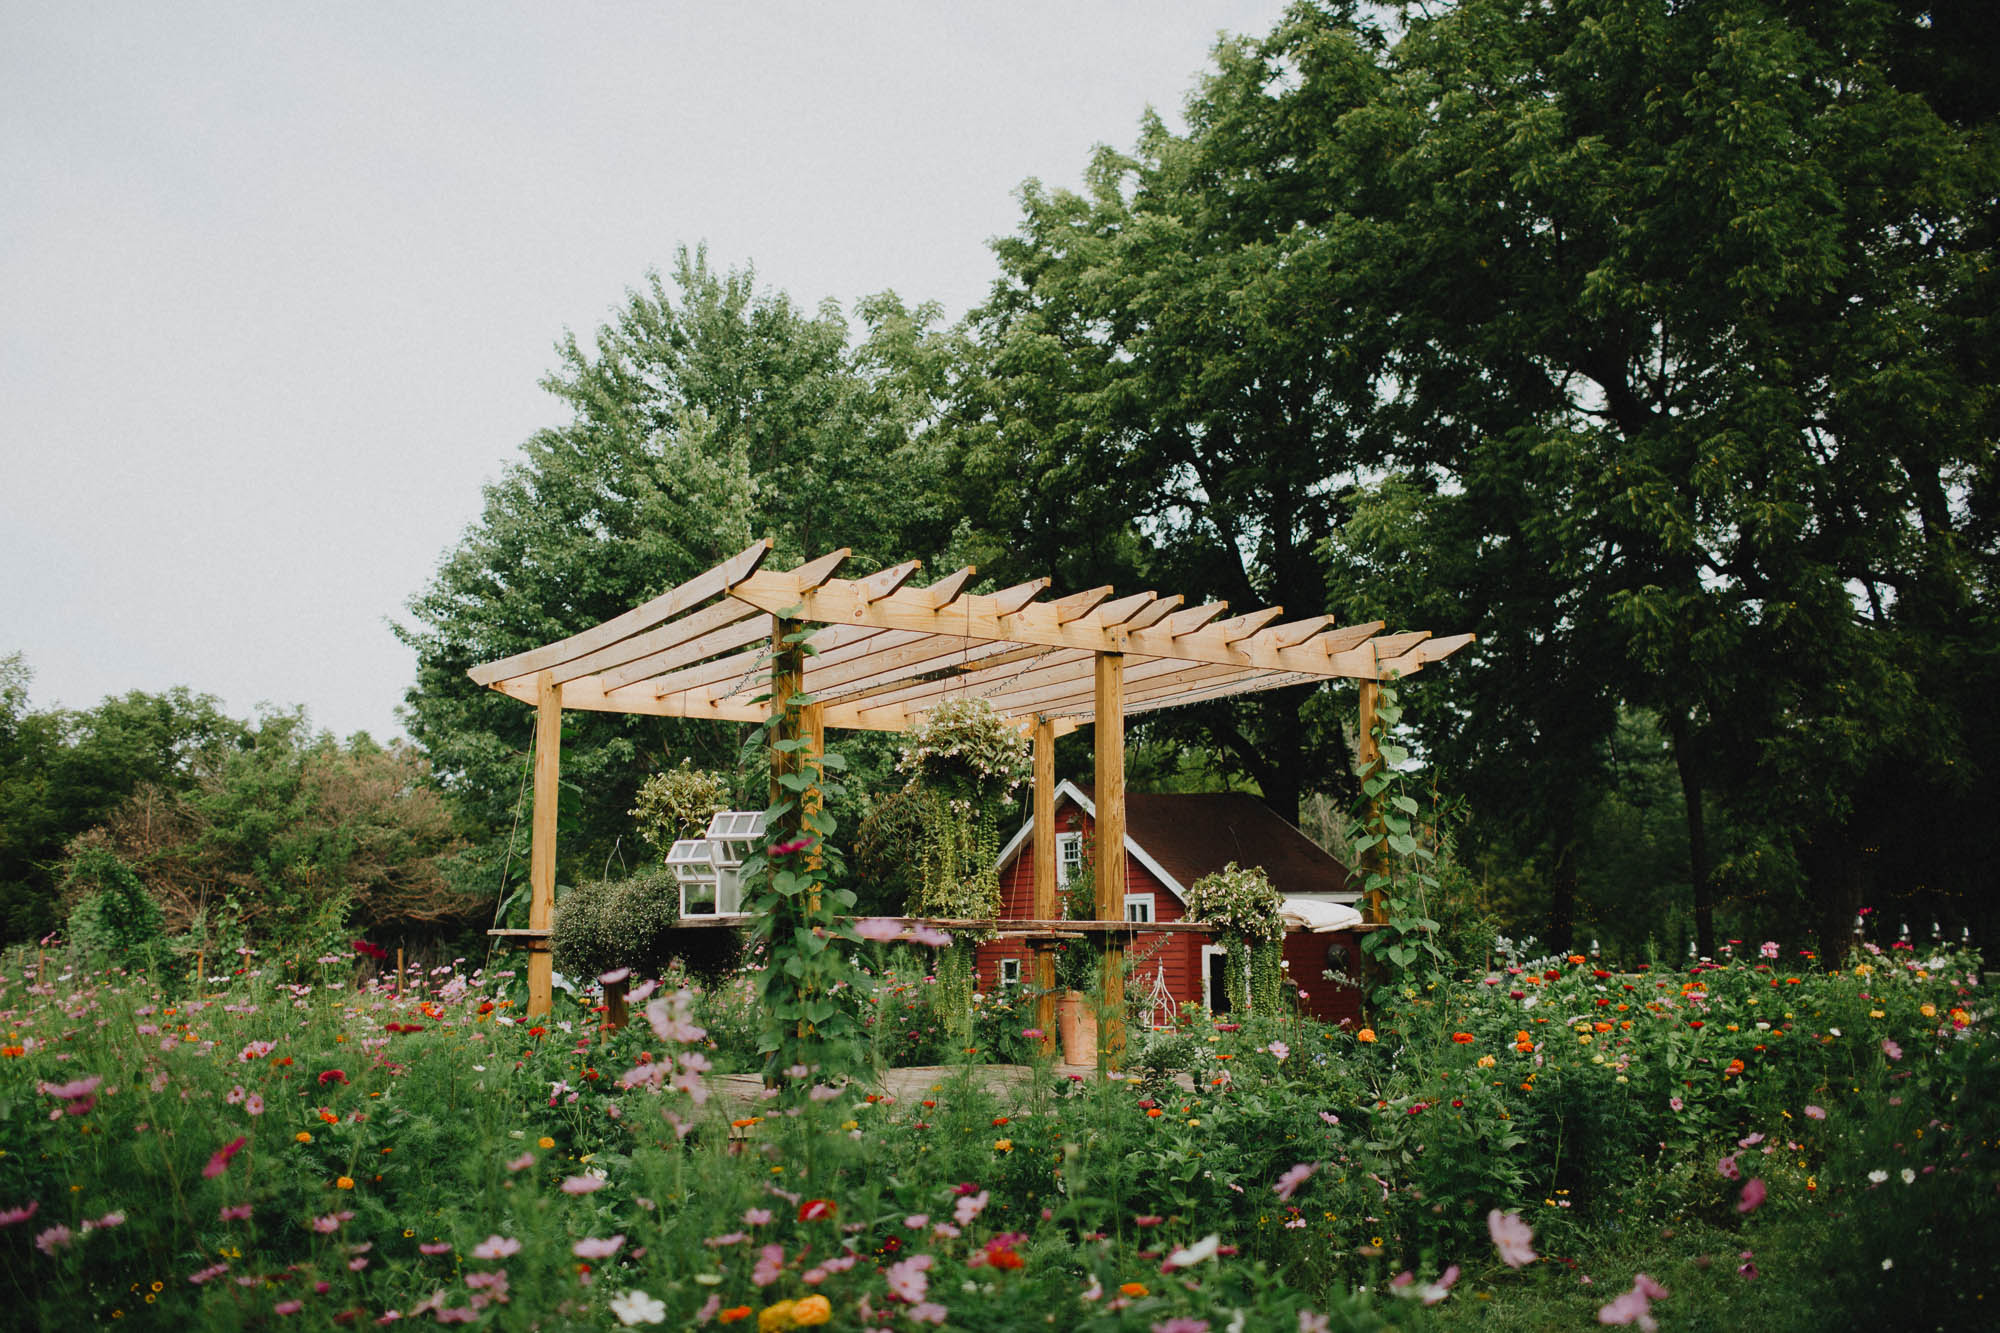 Leah-Graham-Michigan-Outdoor-DIY-Wedding-004@2x.jpg